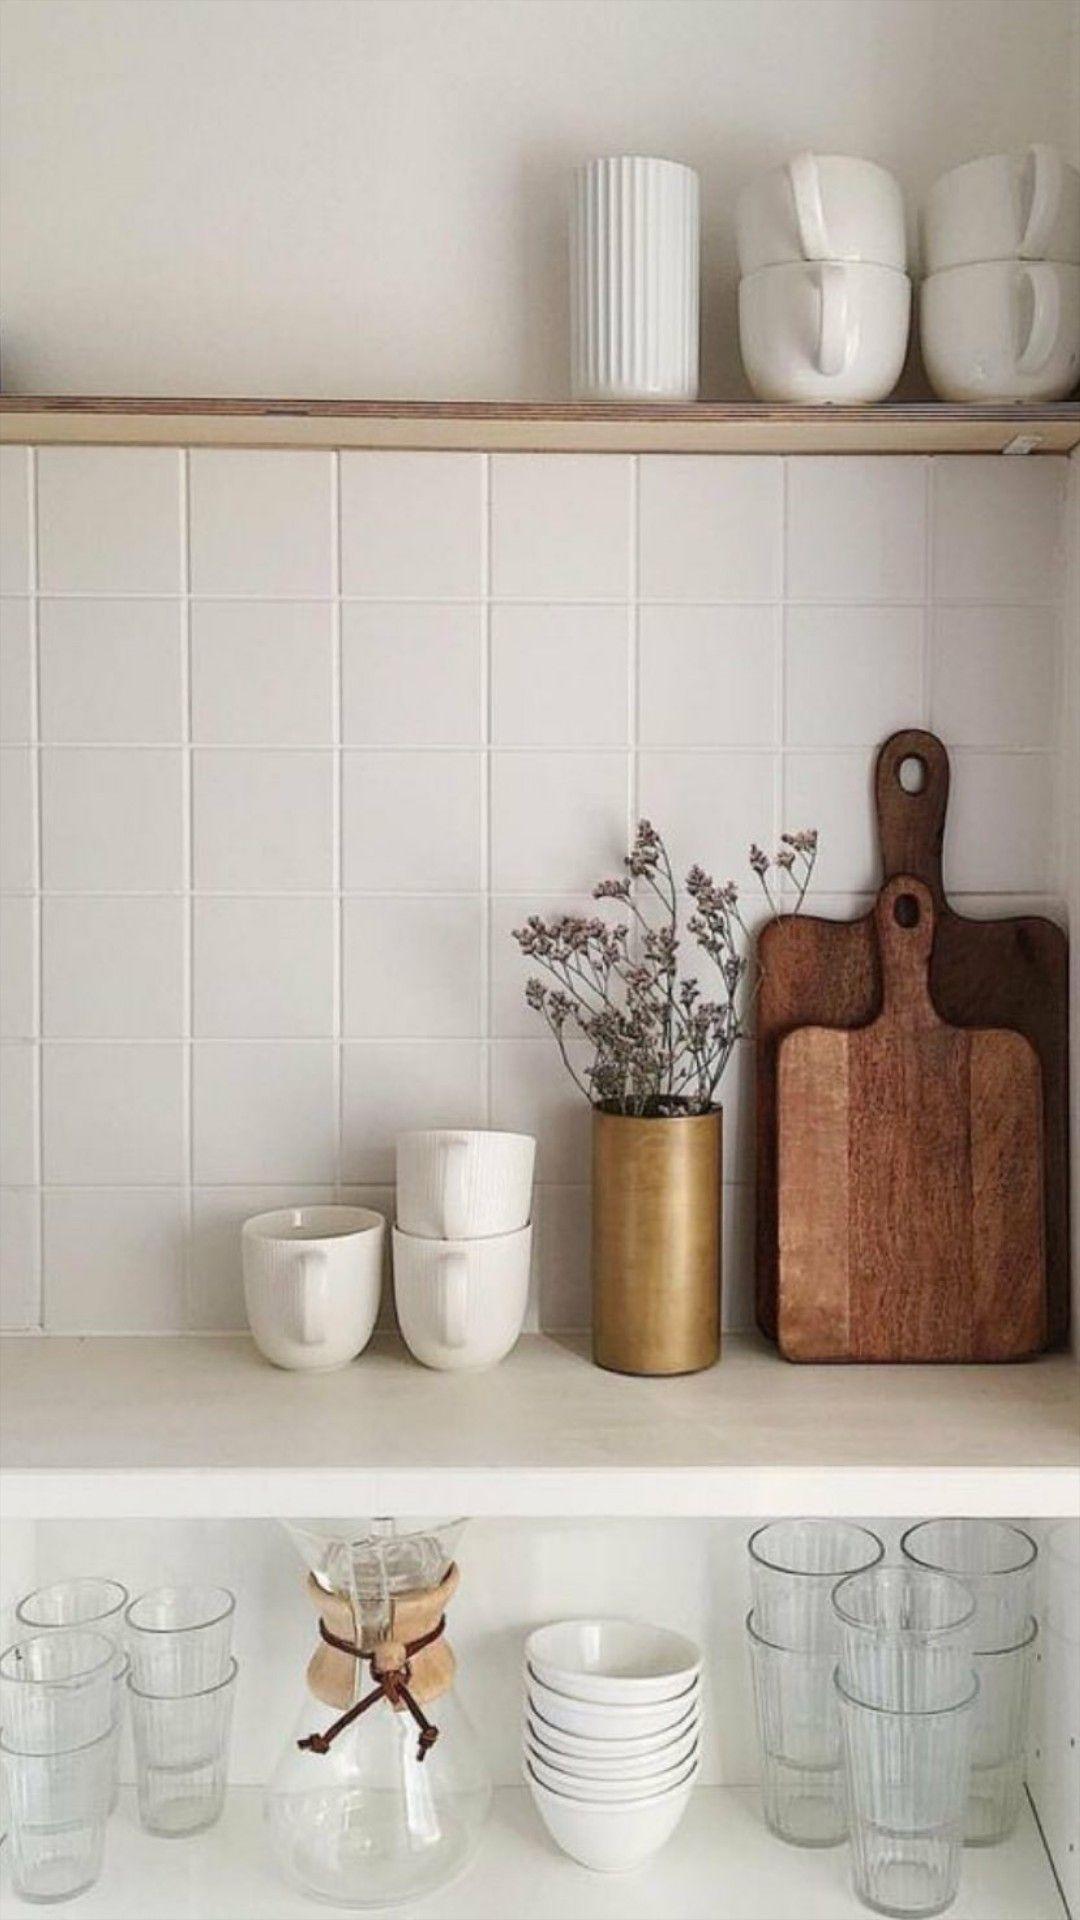 Pin By Fossey Elise On Home Shelf Decor Bedroom Interior Home Decor Inspiration